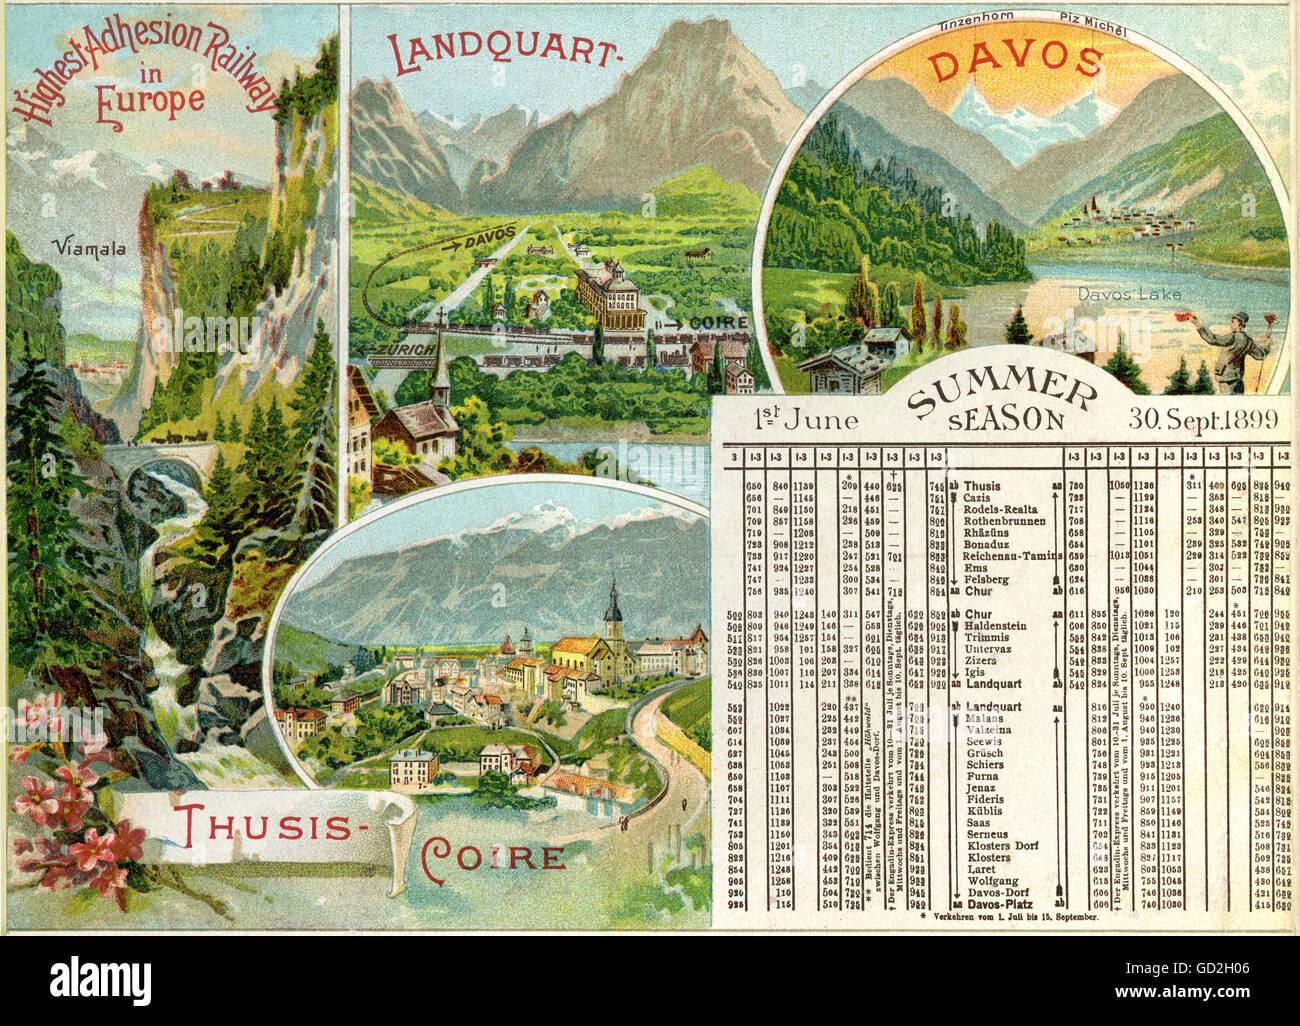 transport / transportation, railway, Rhaetian railway, adhesion railway, opened: 1888, enhanced: 1896, summer timetable - Stock Image